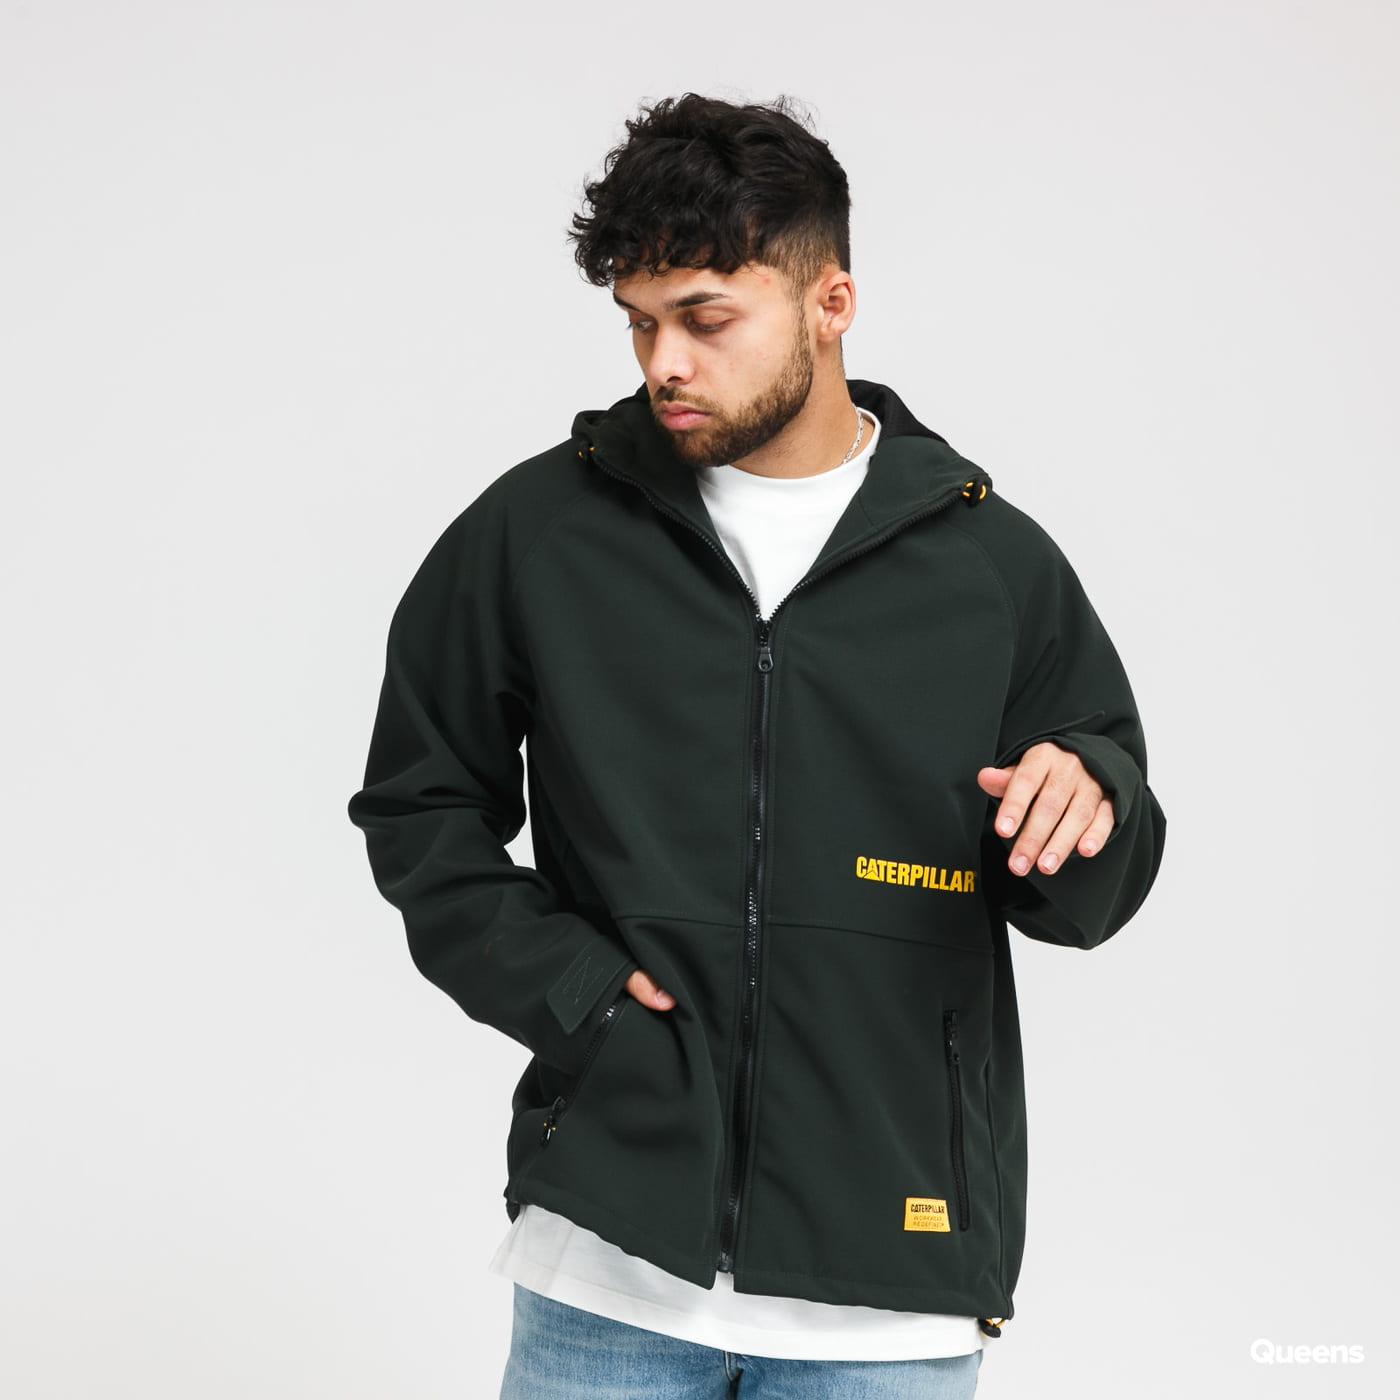 CATERPILLAR Basic Outdoor Jacket dark olive